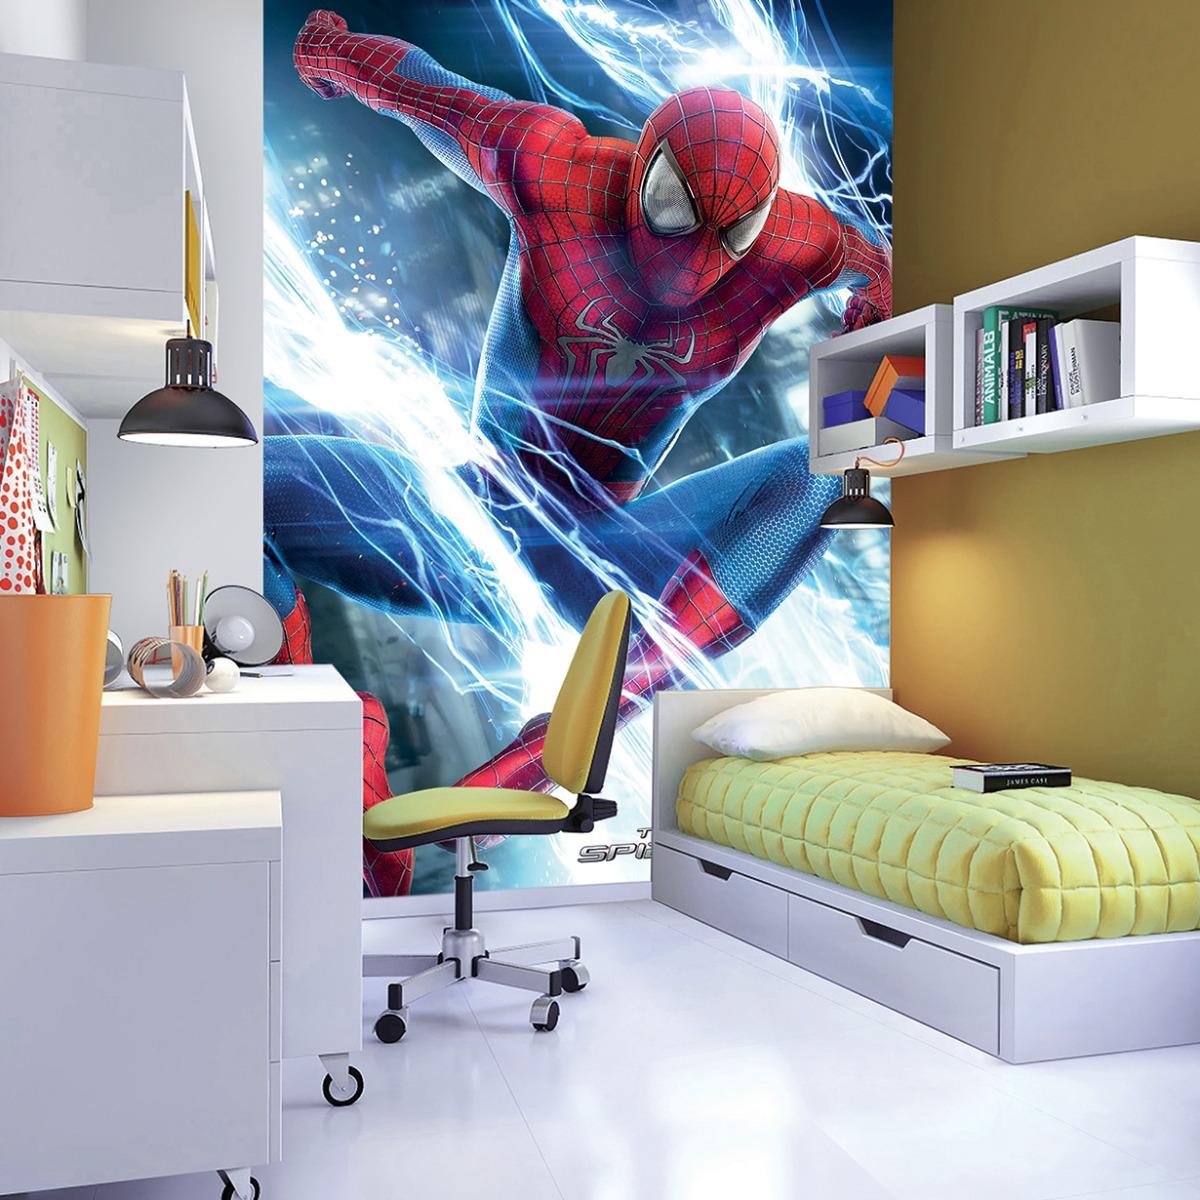 Spiderman Ambiance Wall Mural 2.32m x 1.58m